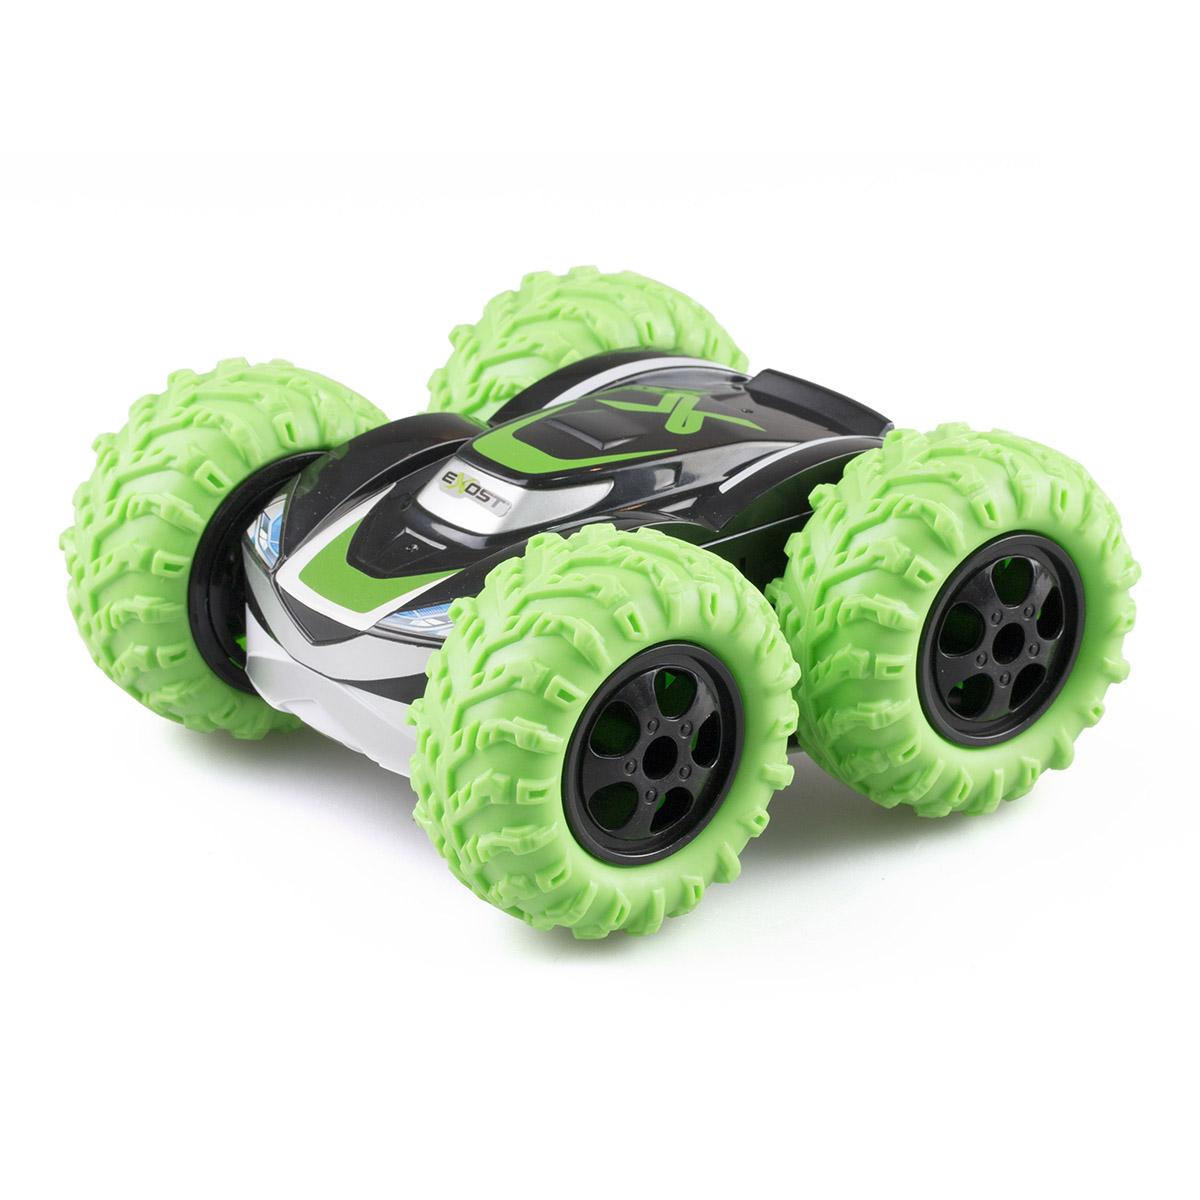 картинка Машина на радиоуправлении 360 Кросс 2 зеленая из серии Exost от магазина Bebikam.ru